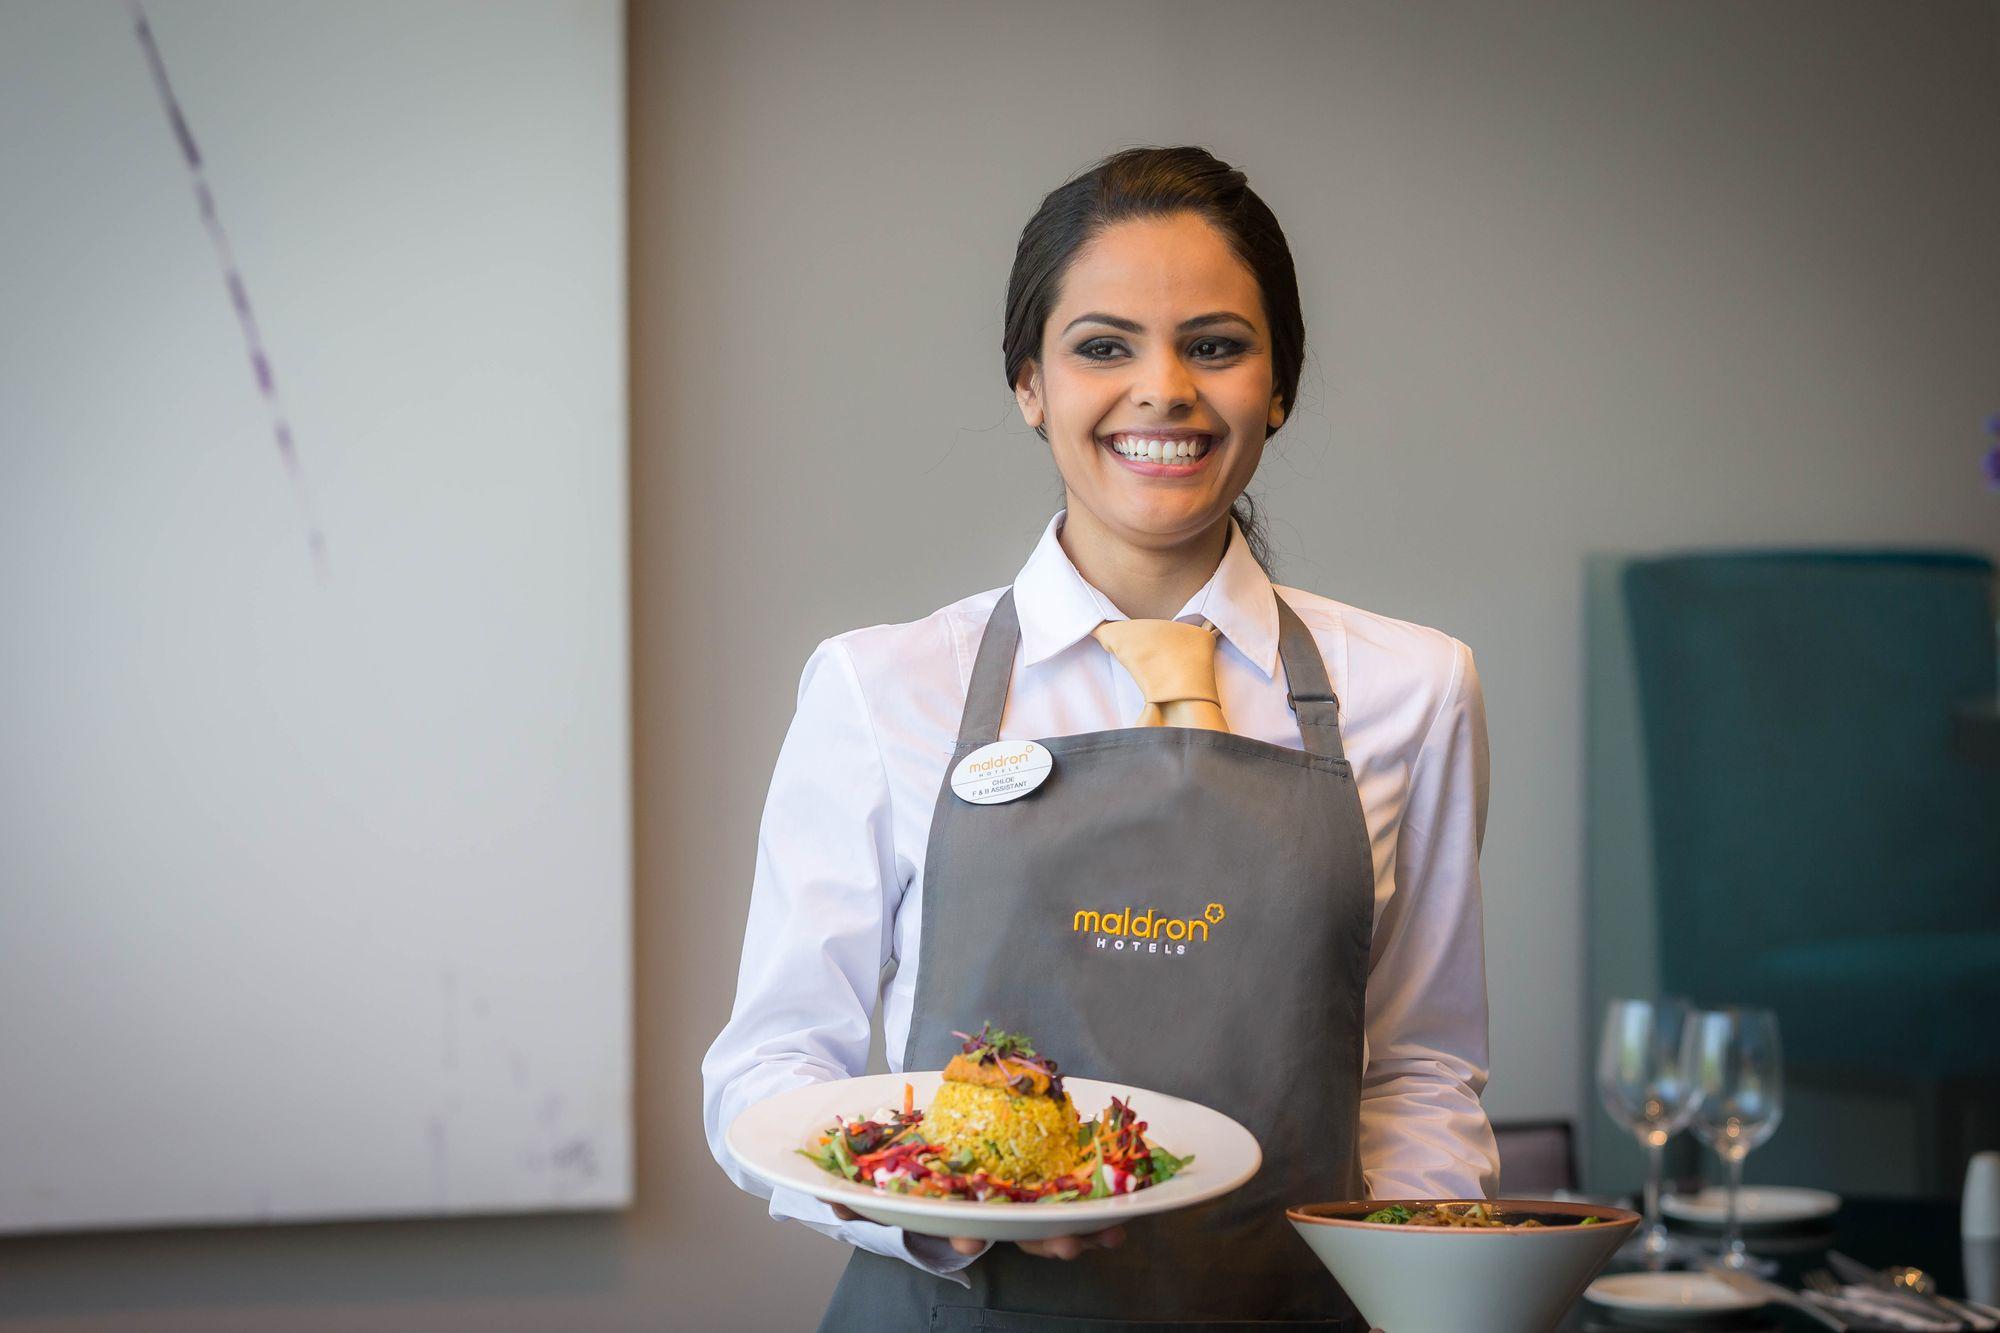 Waiteress-Serving-Food